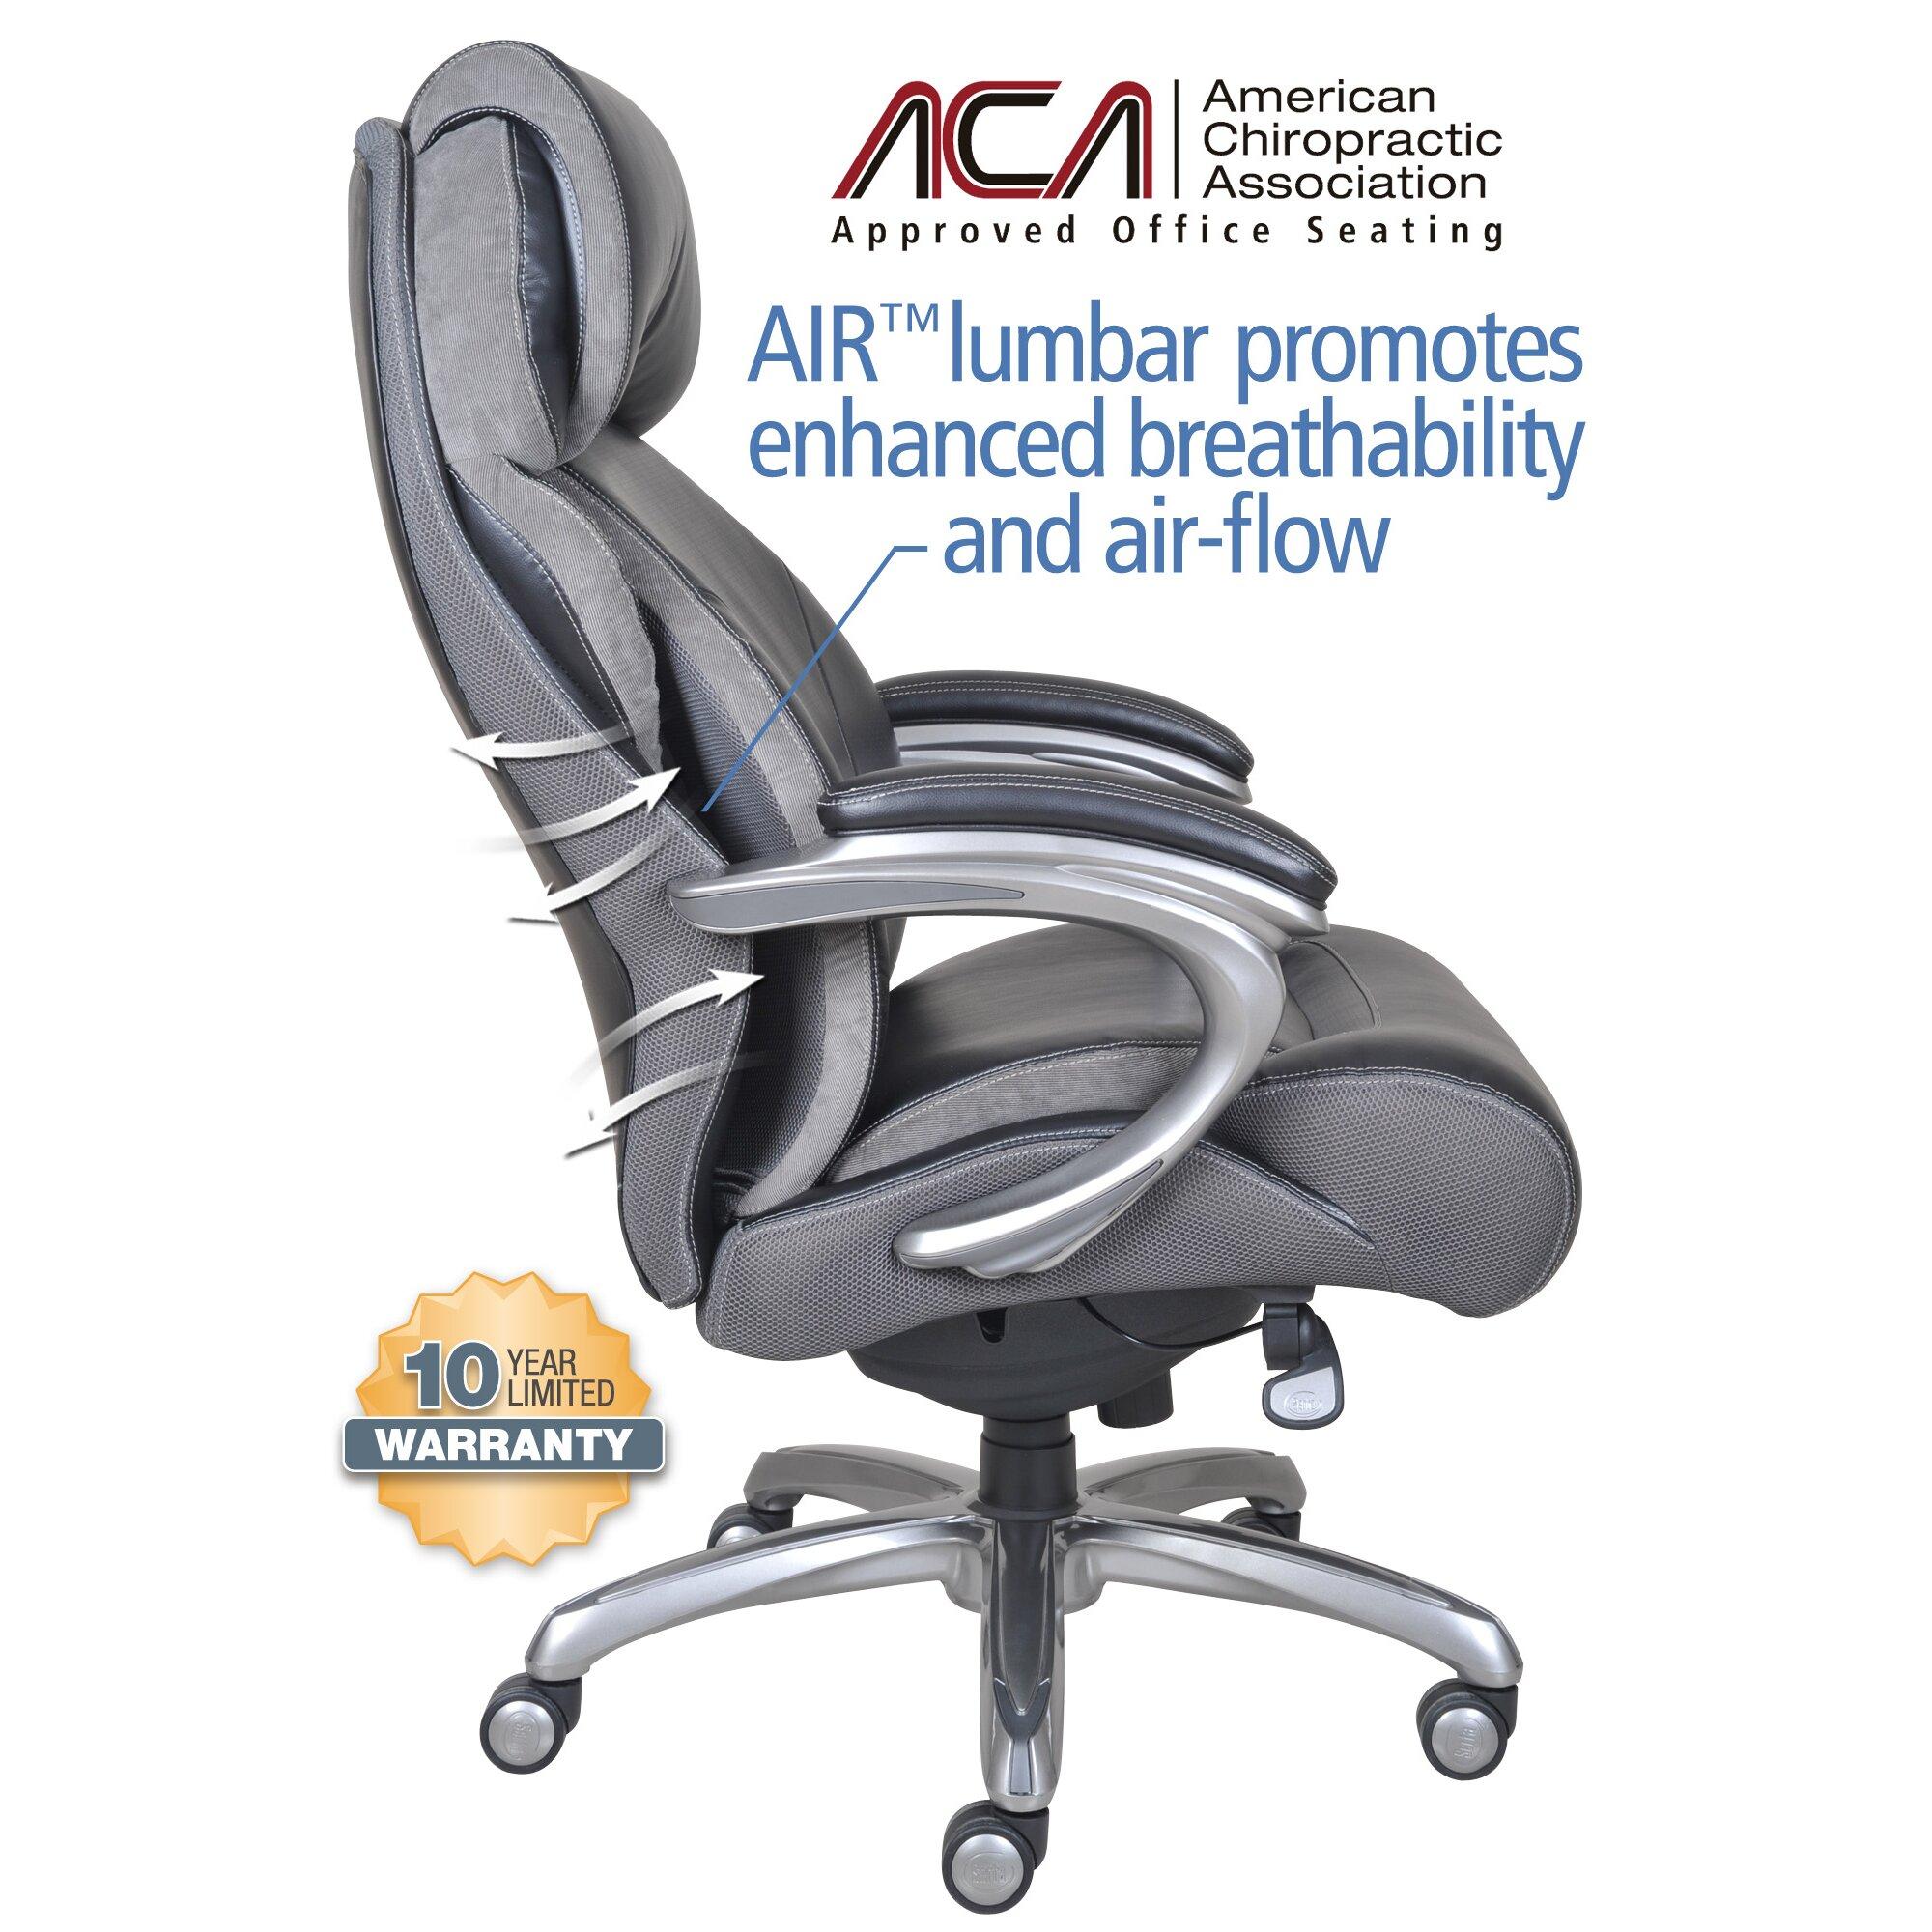 Serta Tranquility Mattress ... Office Furniture ... All Office Chairs Serta at Home SKU: SERT1039